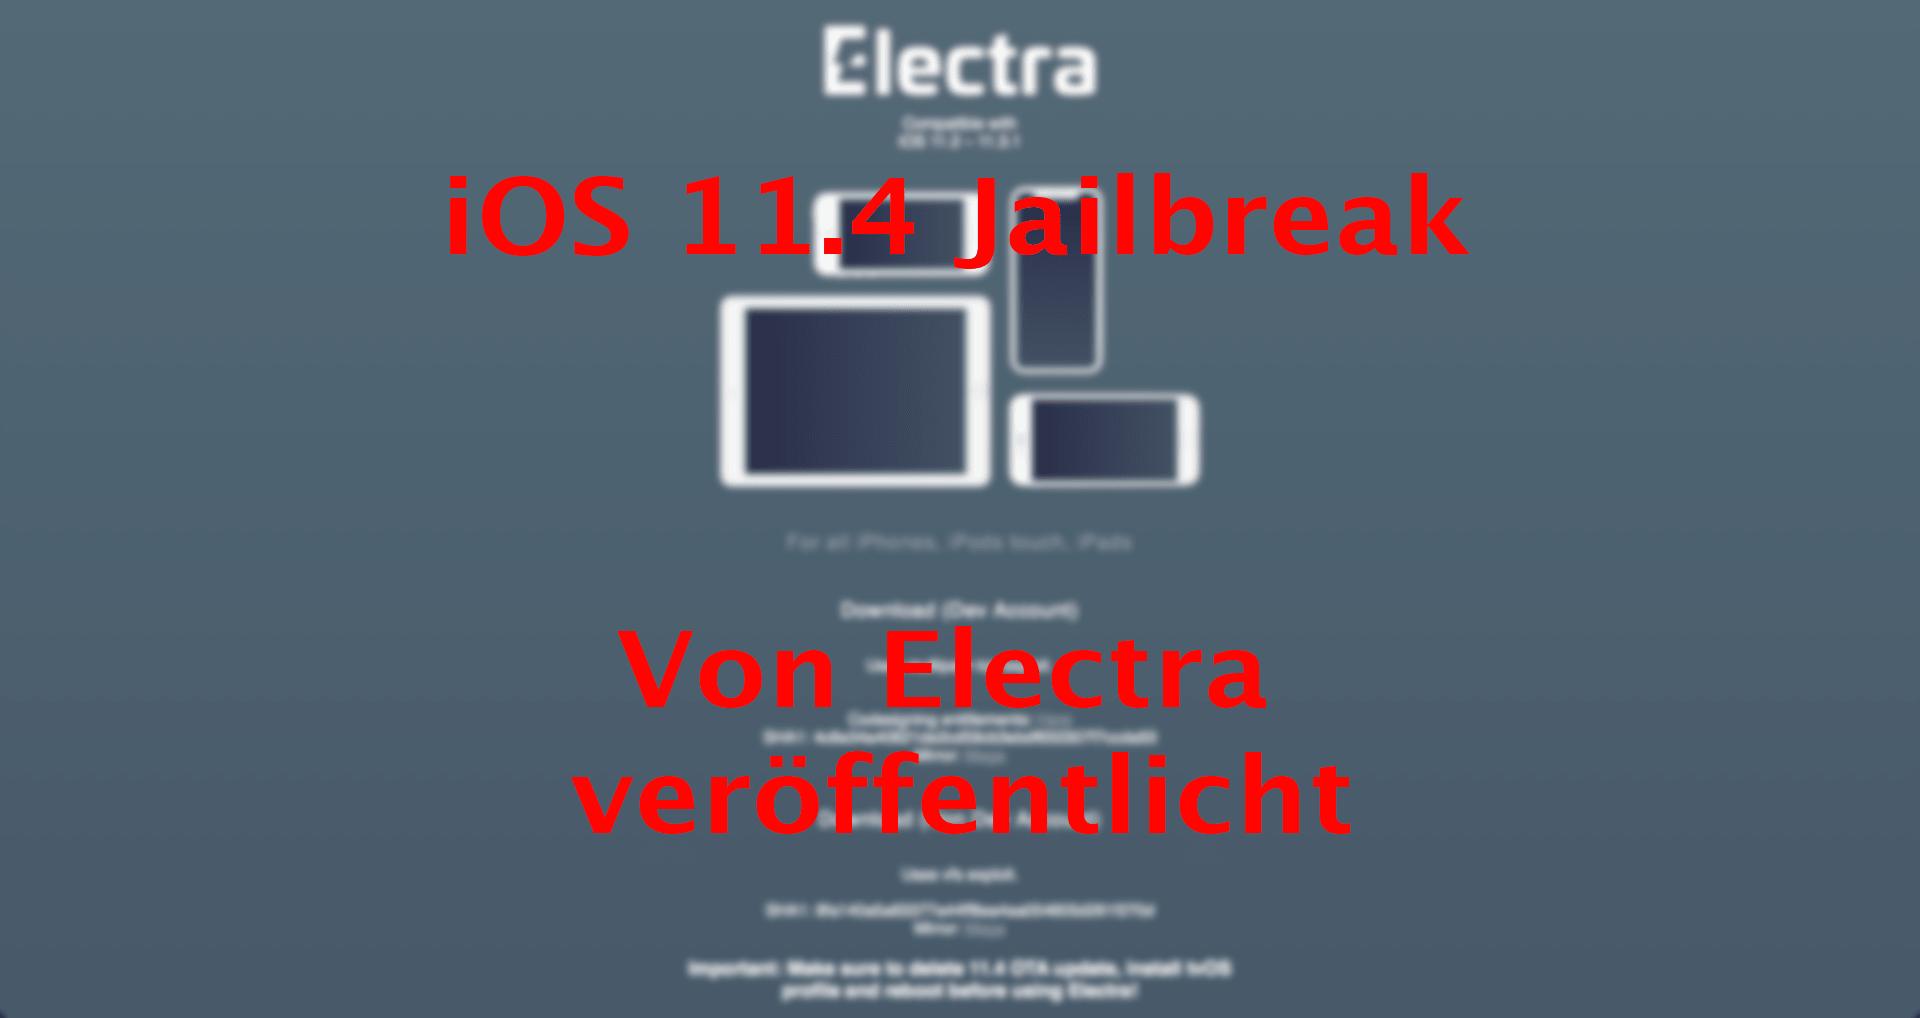 iOS 11.4 / iOS 11.4.1 Jailbreak